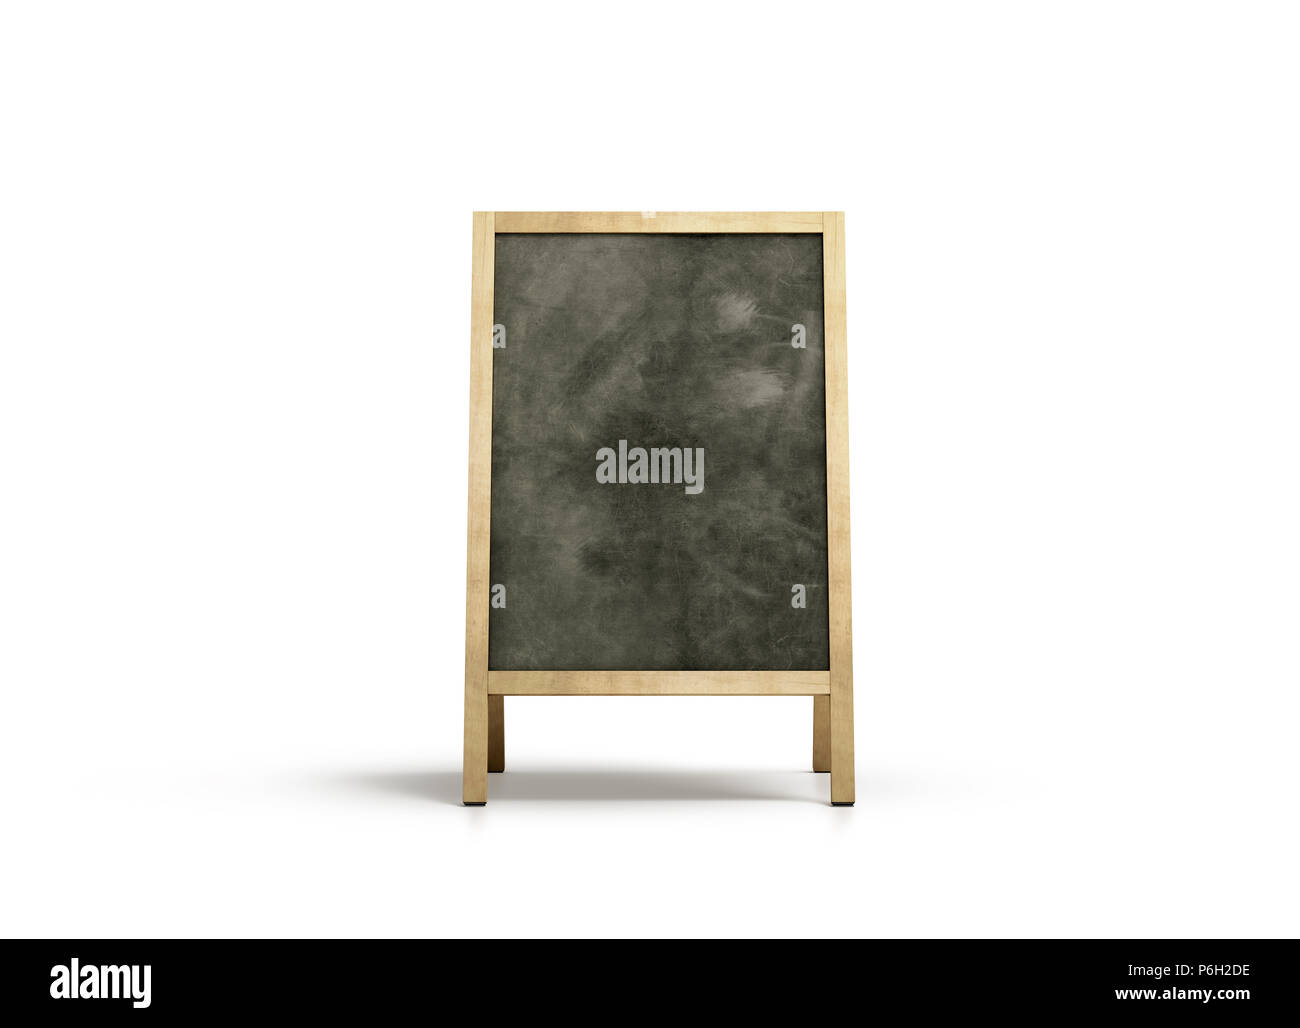 blank outdoor chalkboard stand